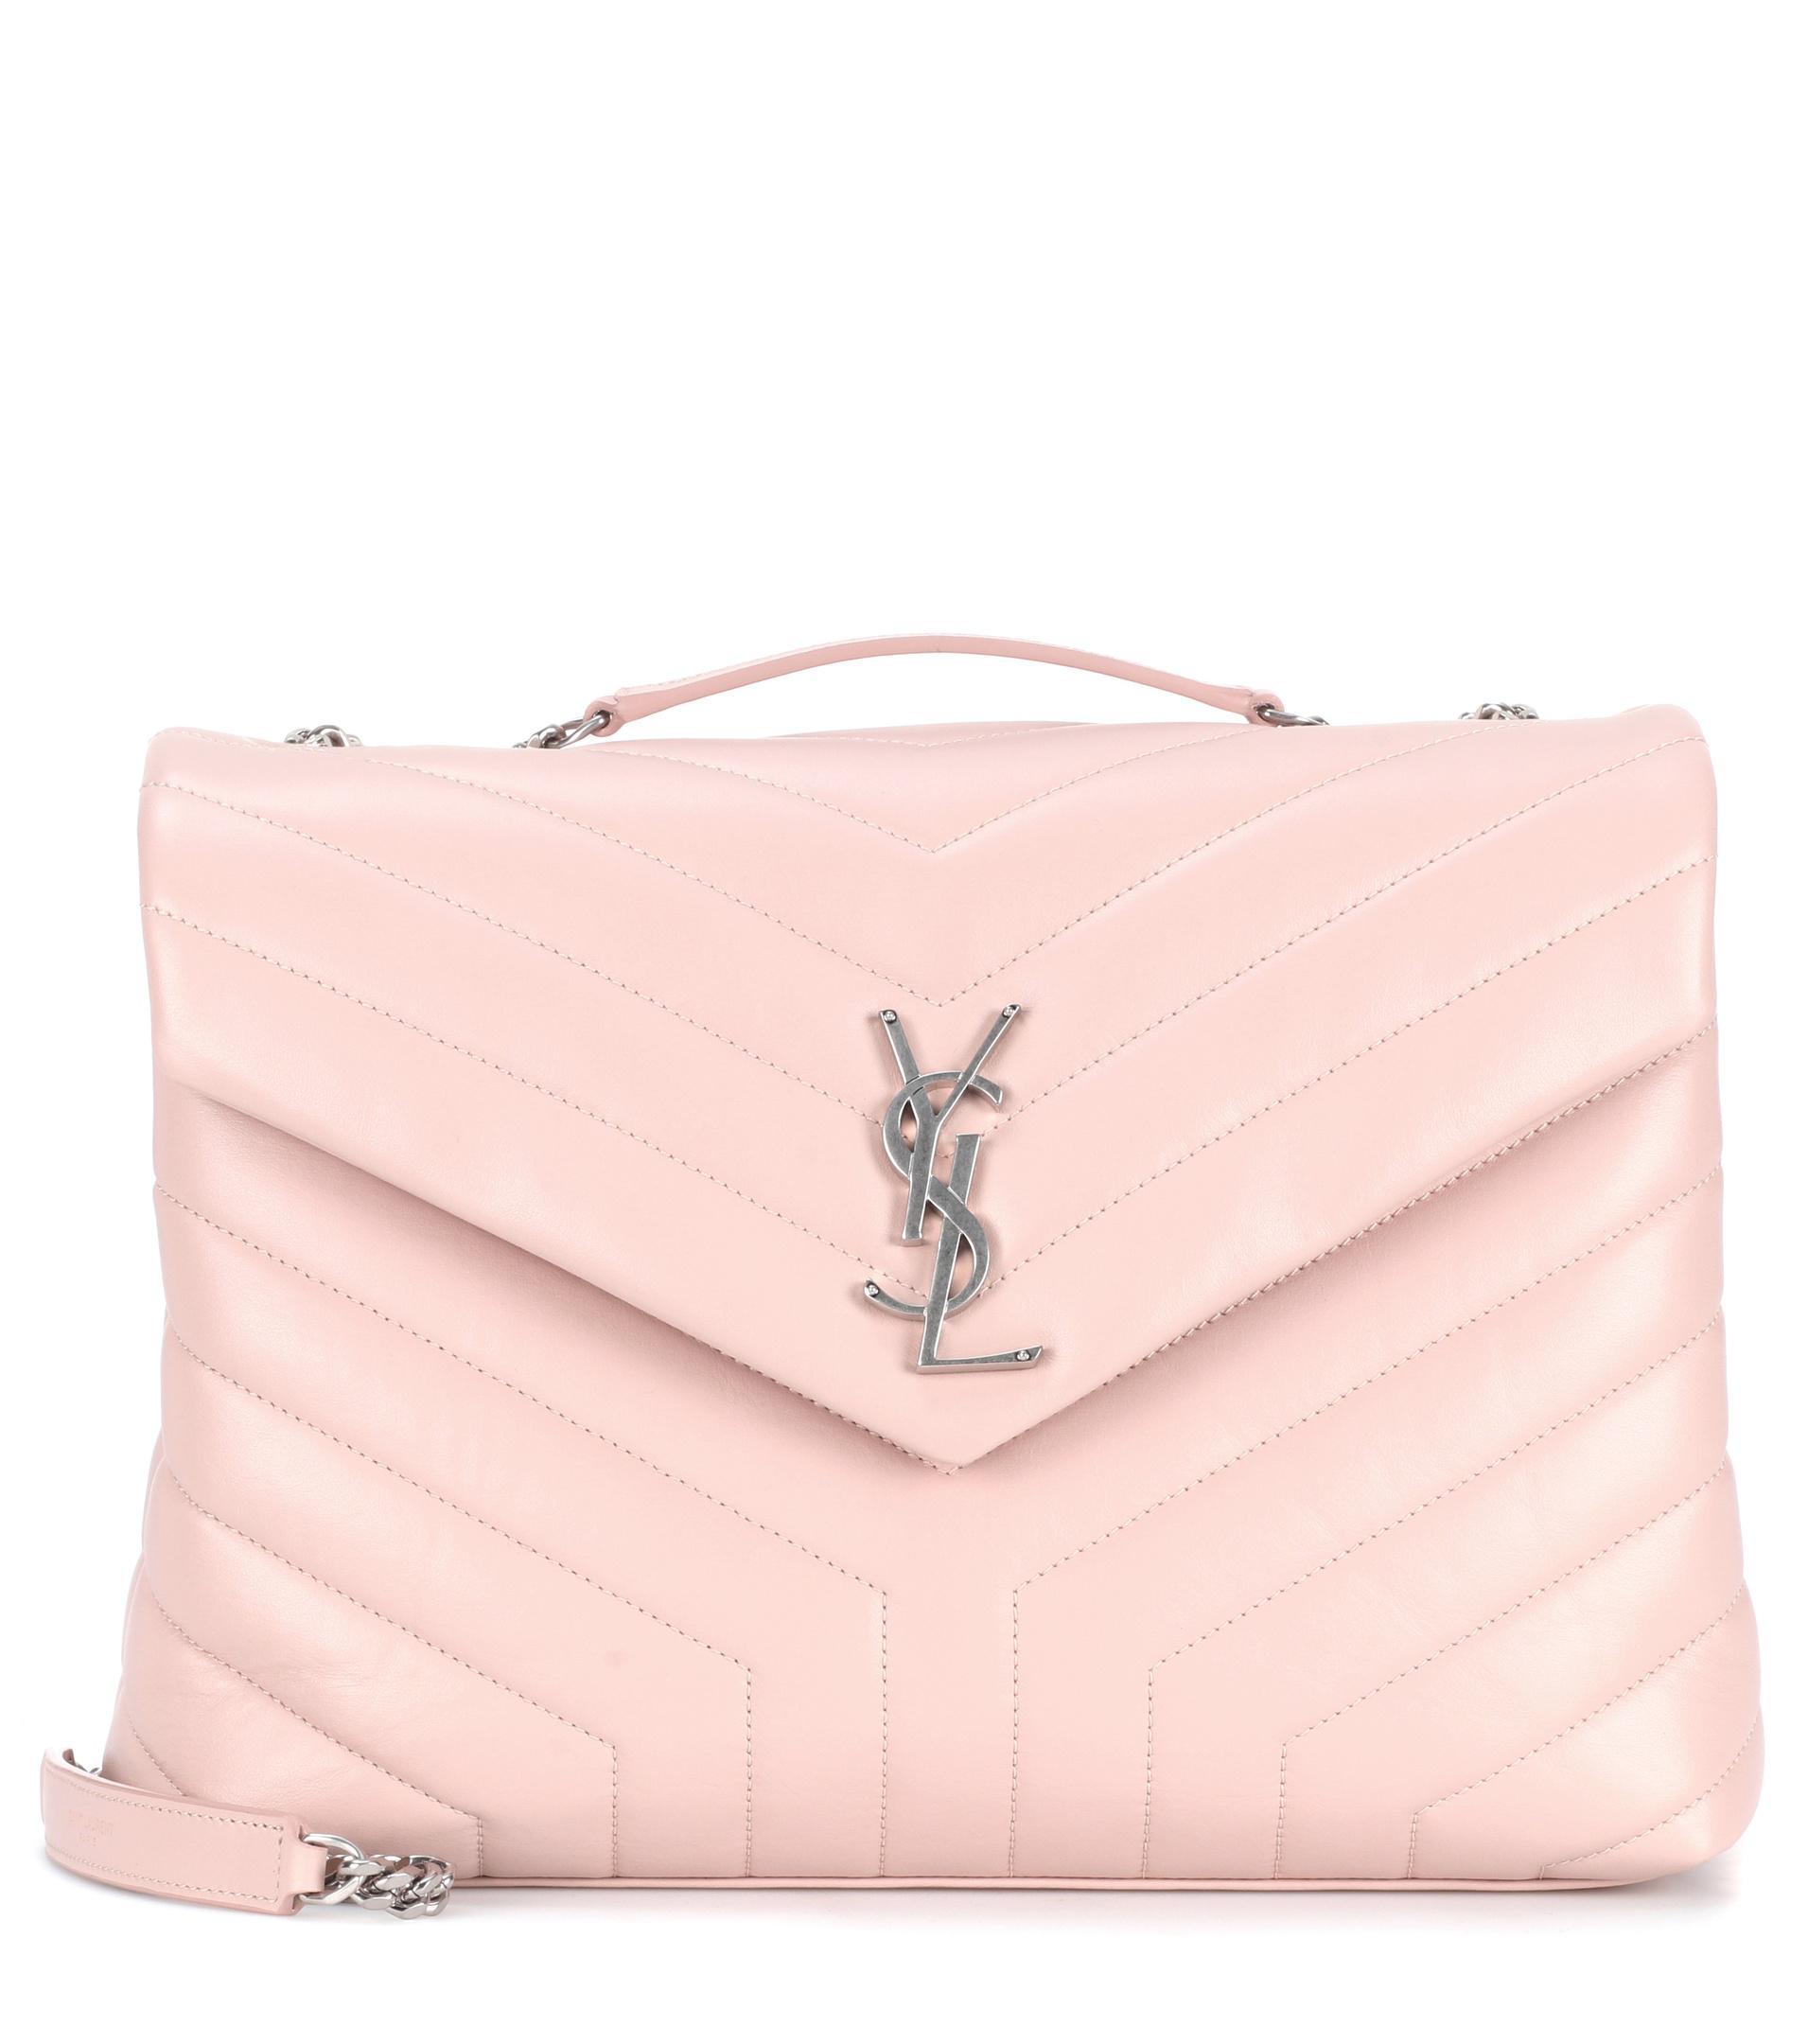 Pink Loulou Monogram Mini Bag - Pink & Purple Saint Laurent sY5Yj